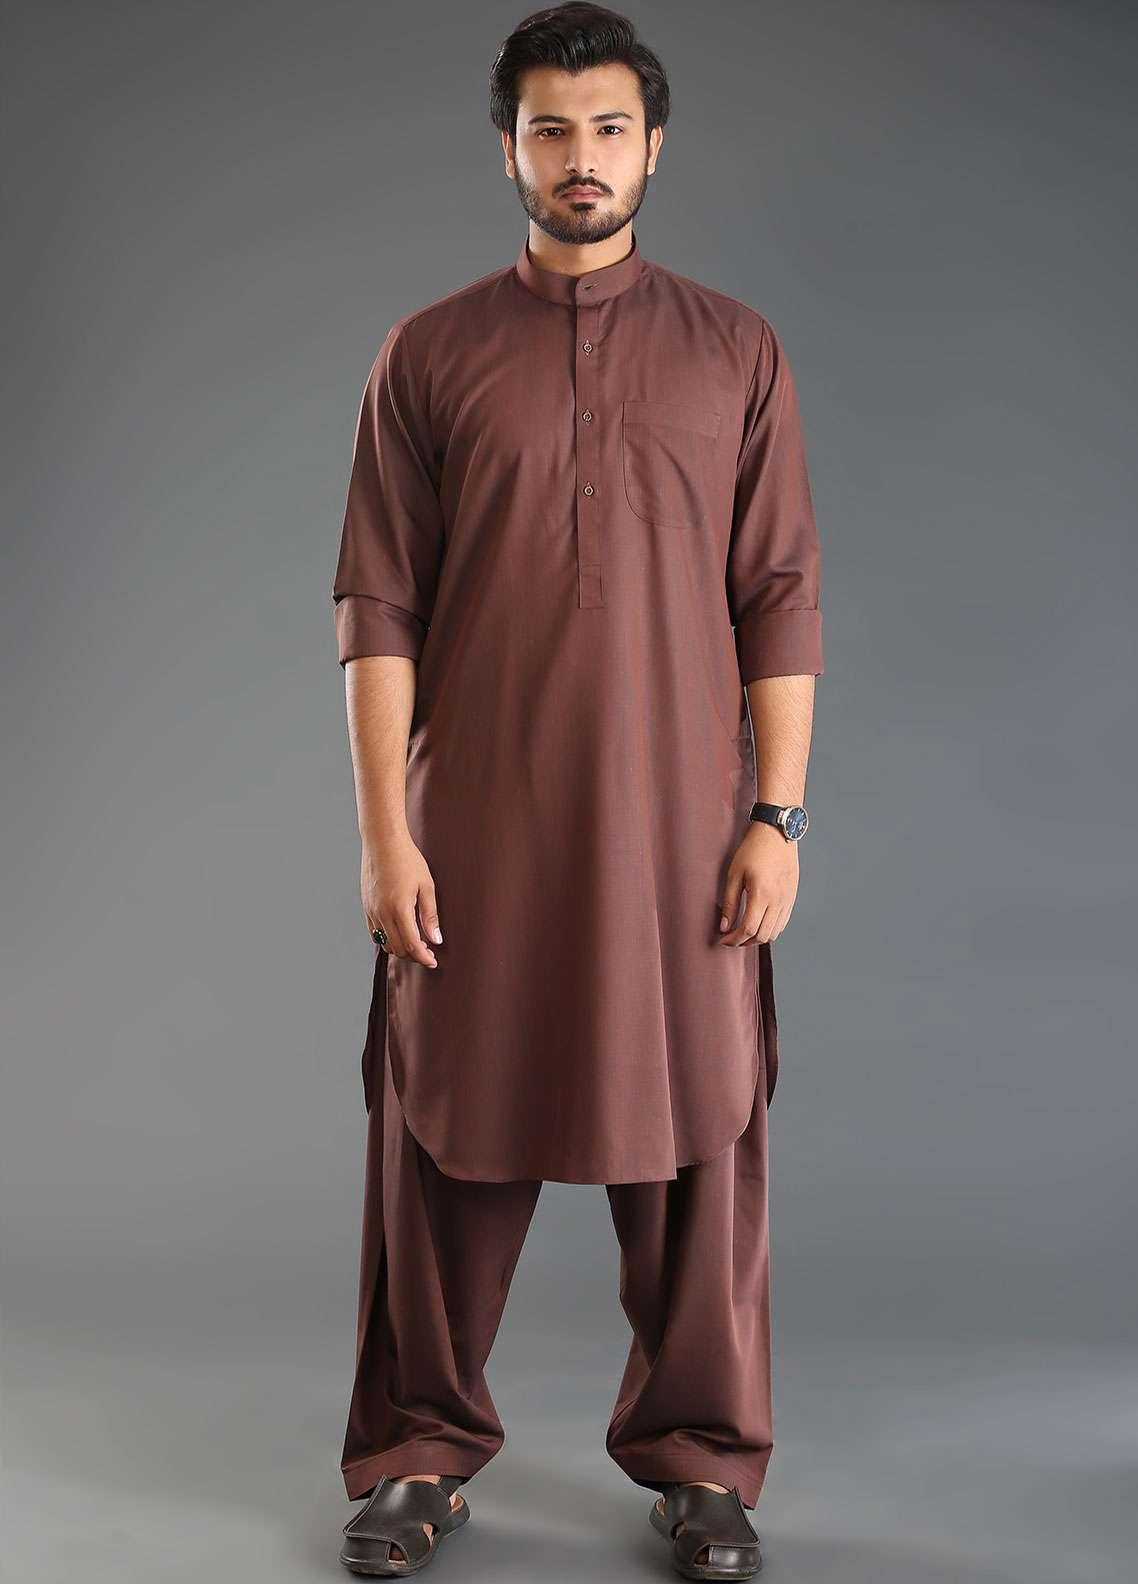 Sanaulla Exclusive Range Wash N Wear Formal Kameez Shalwar for Men - Maroon SKS18W 01